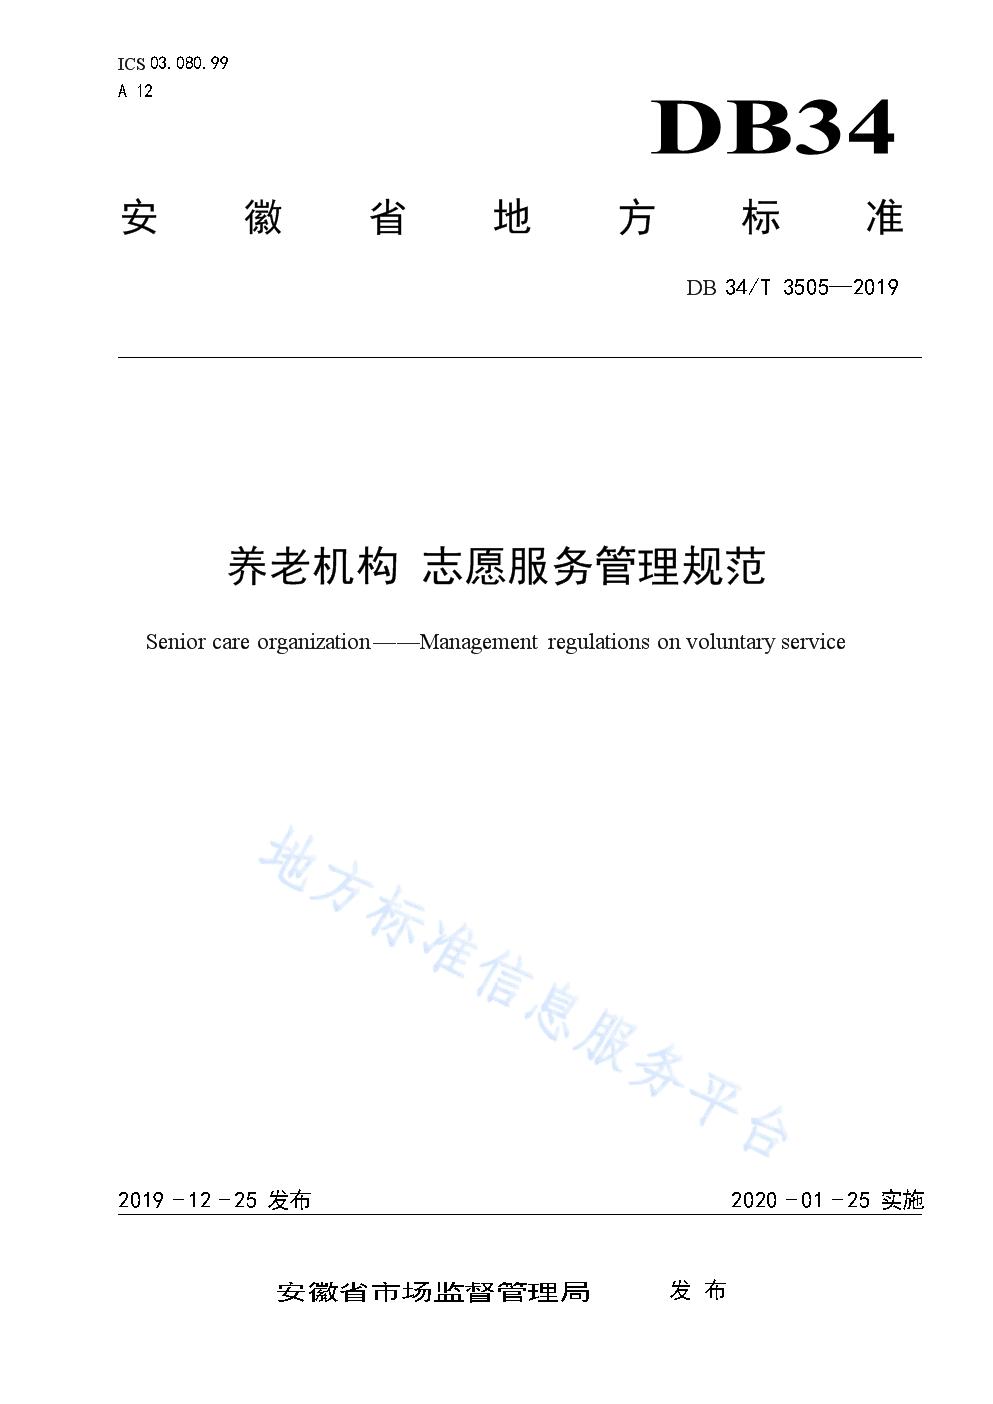 DB34_T3505-2019 养老机构 志愿服务管理规范.docx